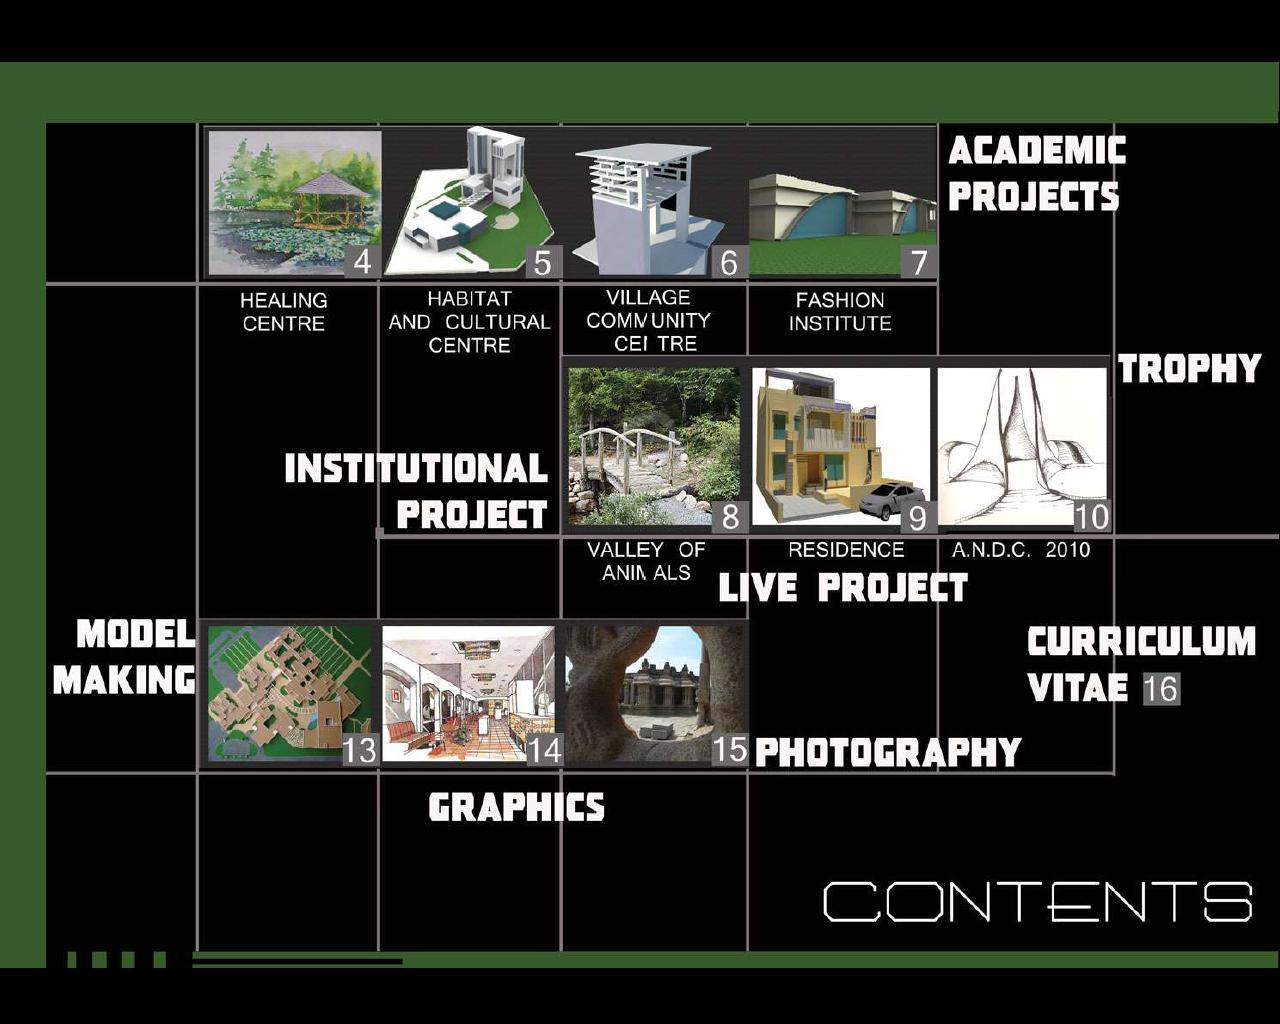 Apuntes revista digital de arquitectura el reto del for Portafolio arquitectura